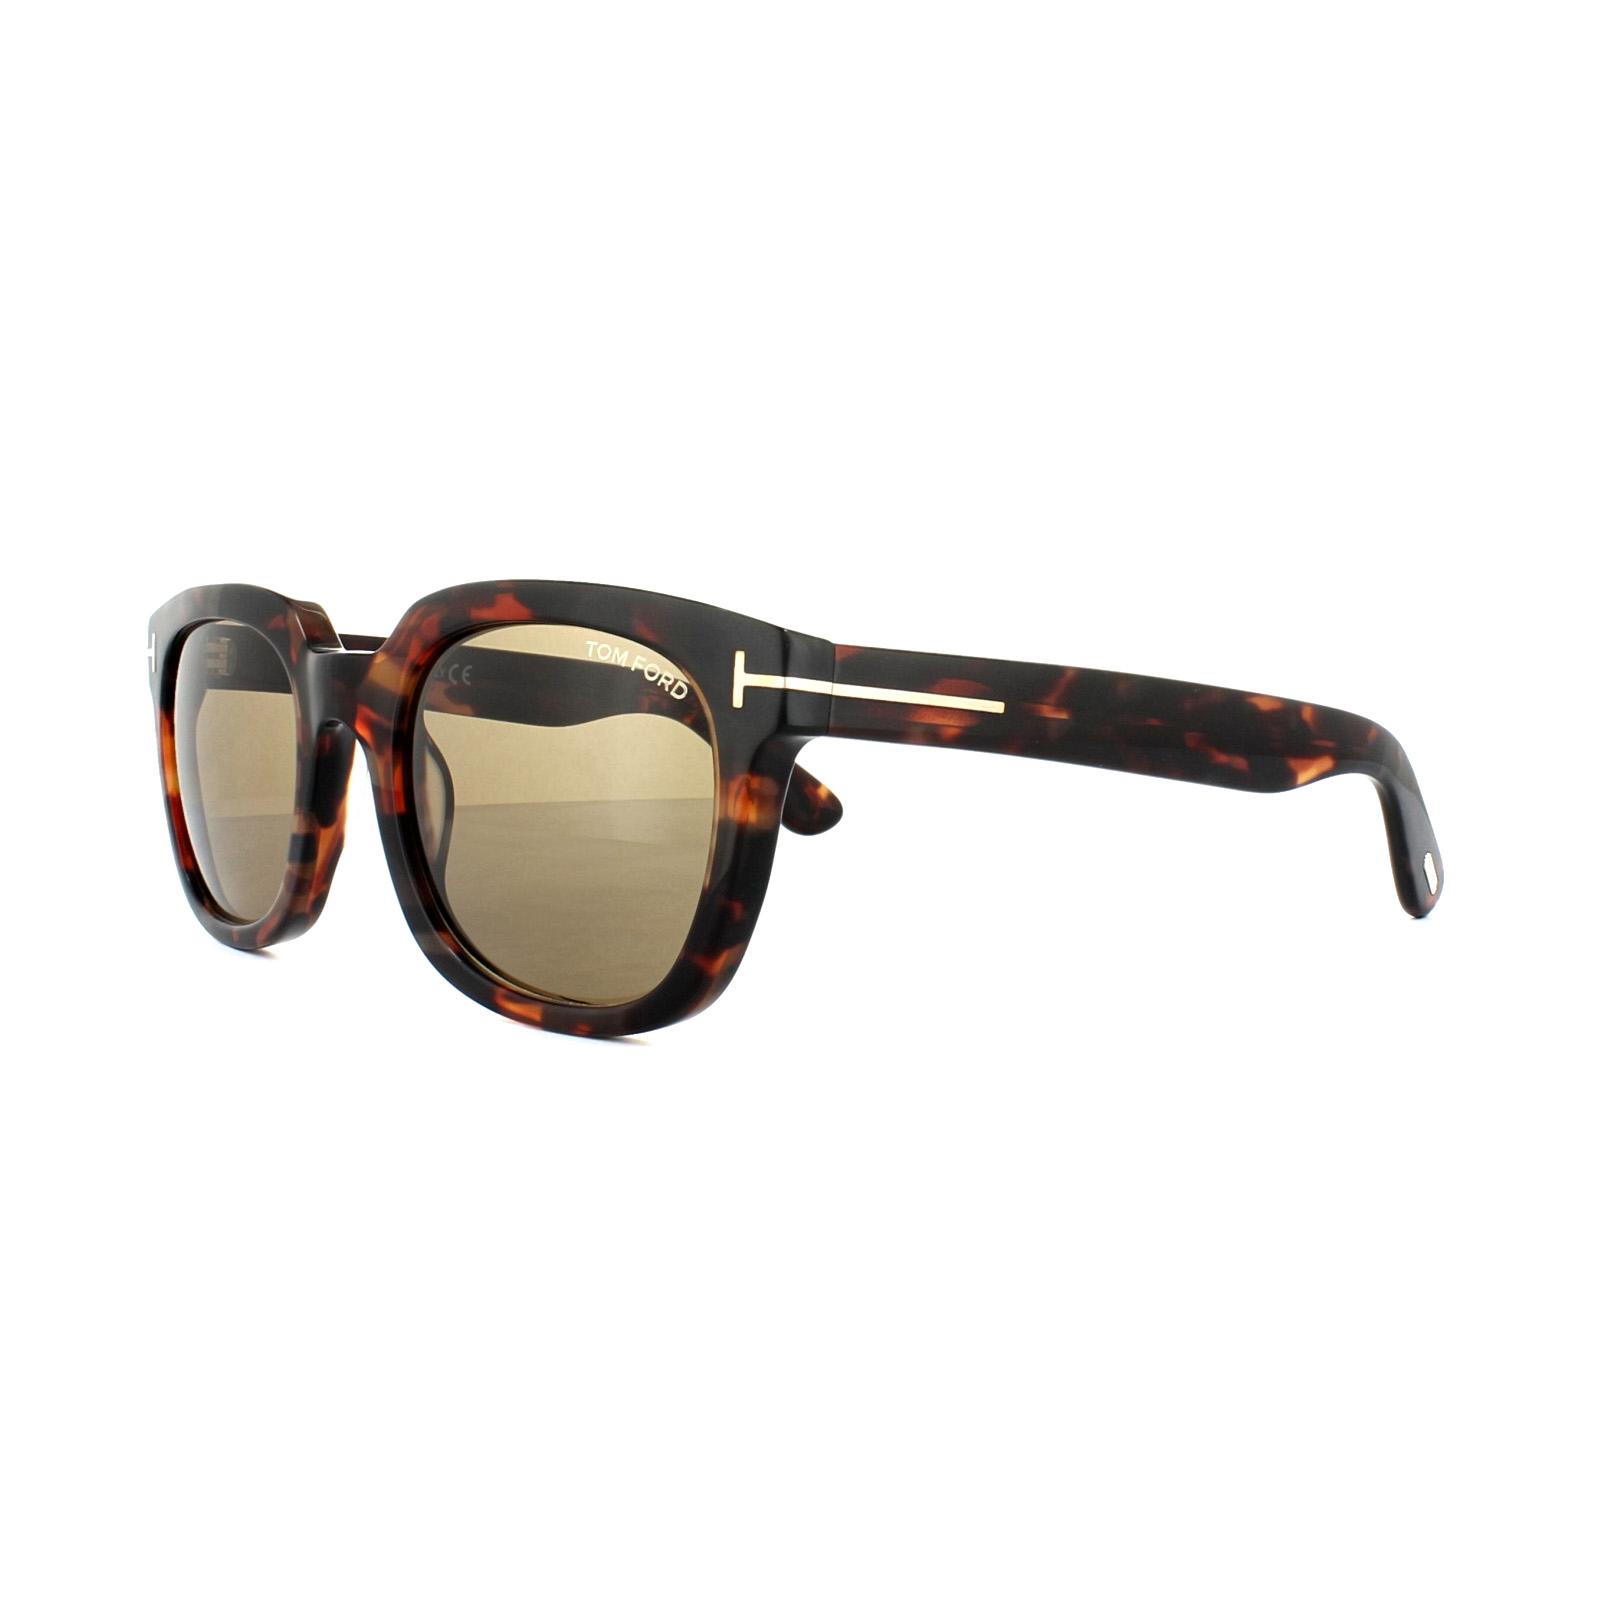 49567669bc53 Sentinel Tom Ford Sunglasses 0198 Campbell 56J Havana Brown Dark Brown